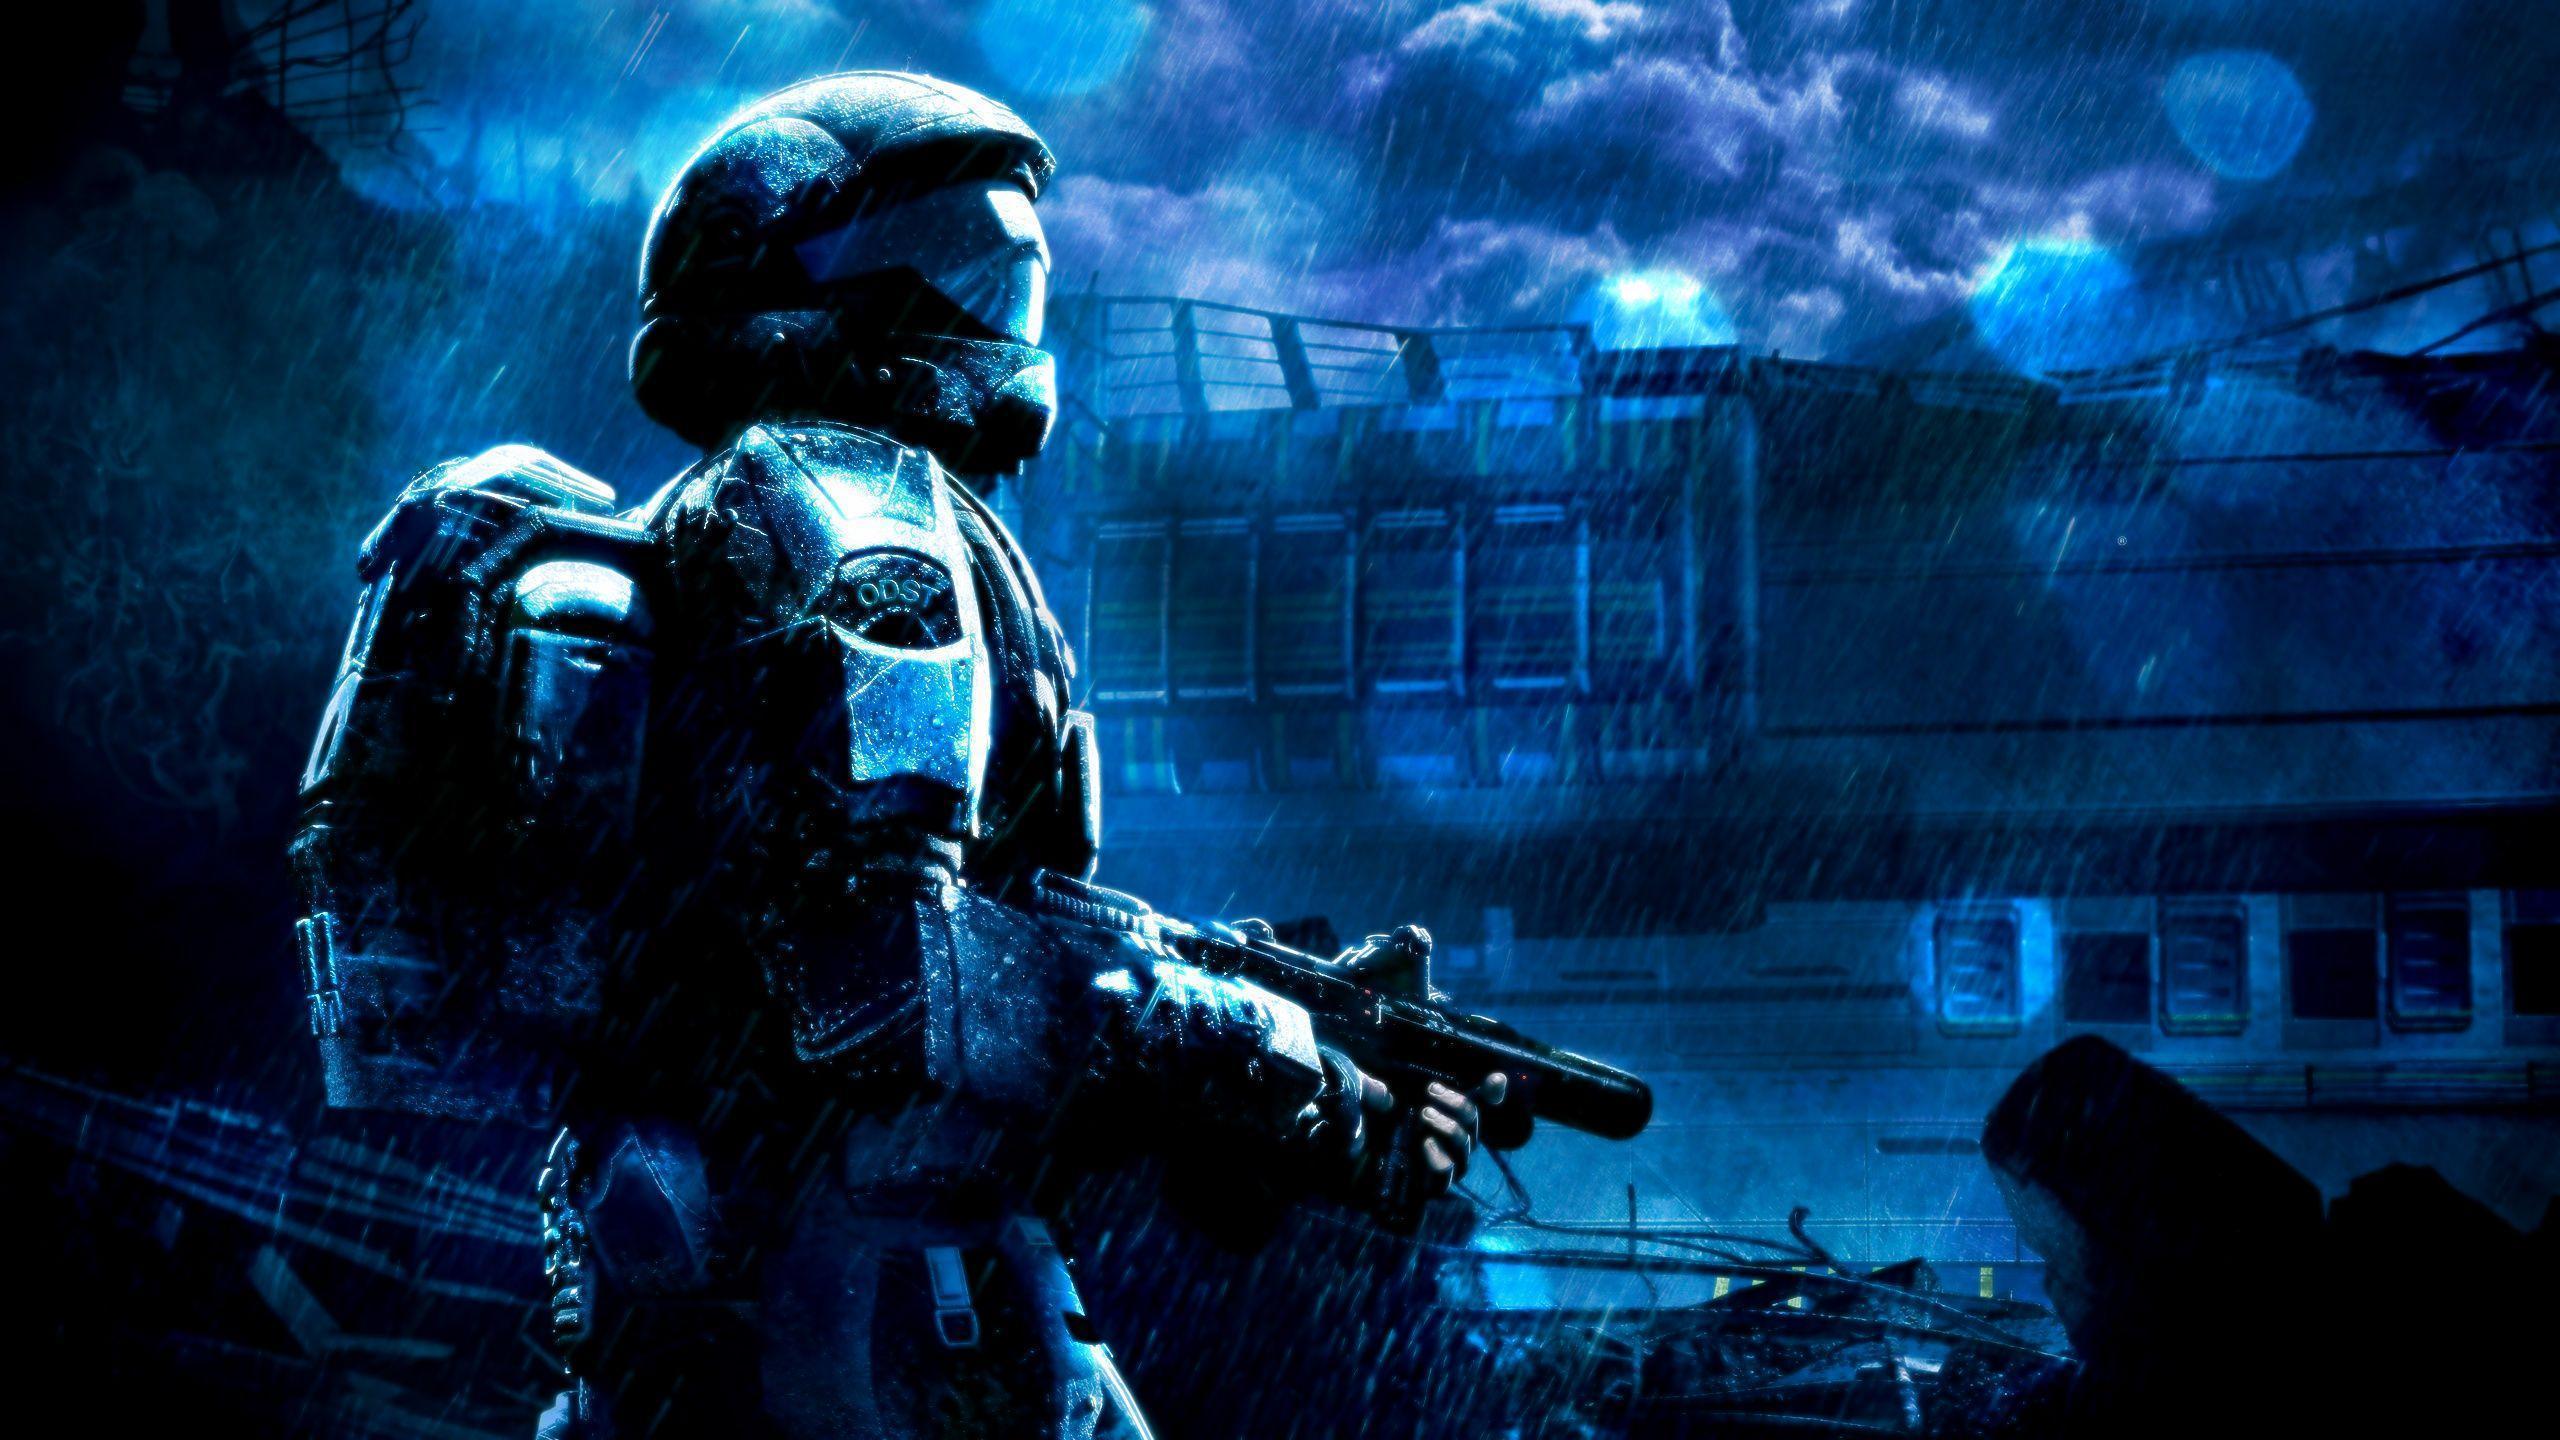 Halo Odst 4k Wallpapers Top Free Halo Odst 4k Backgrounds